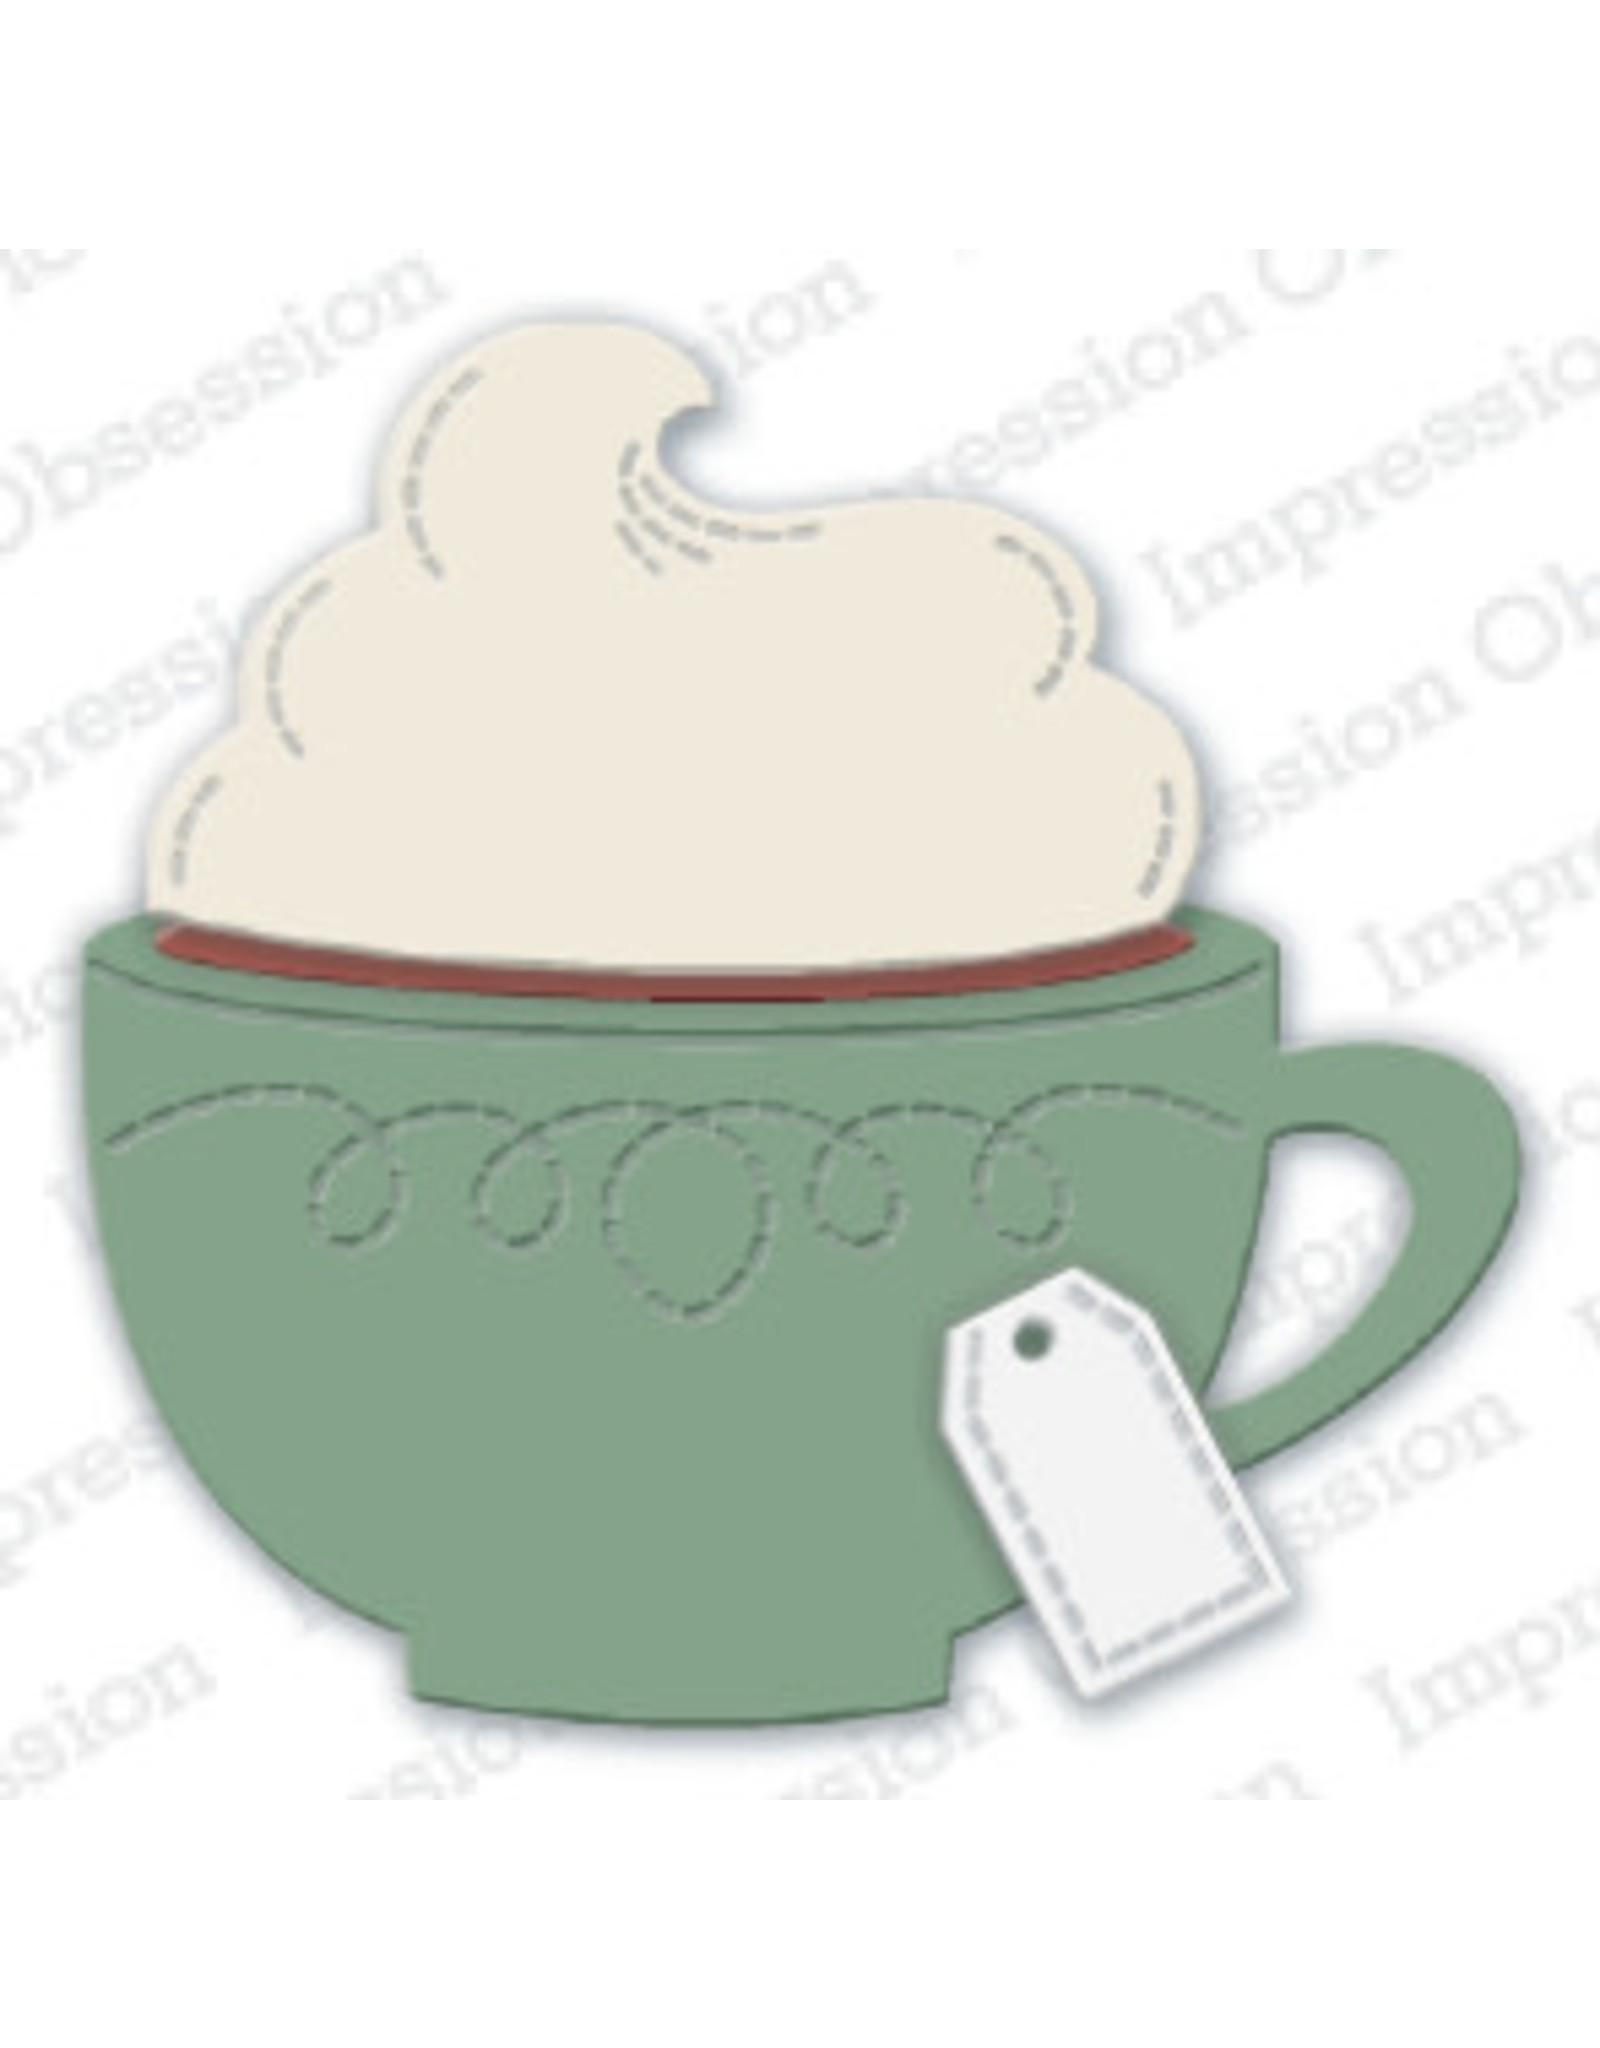 Impression Obsession Tea Cocoa - Die